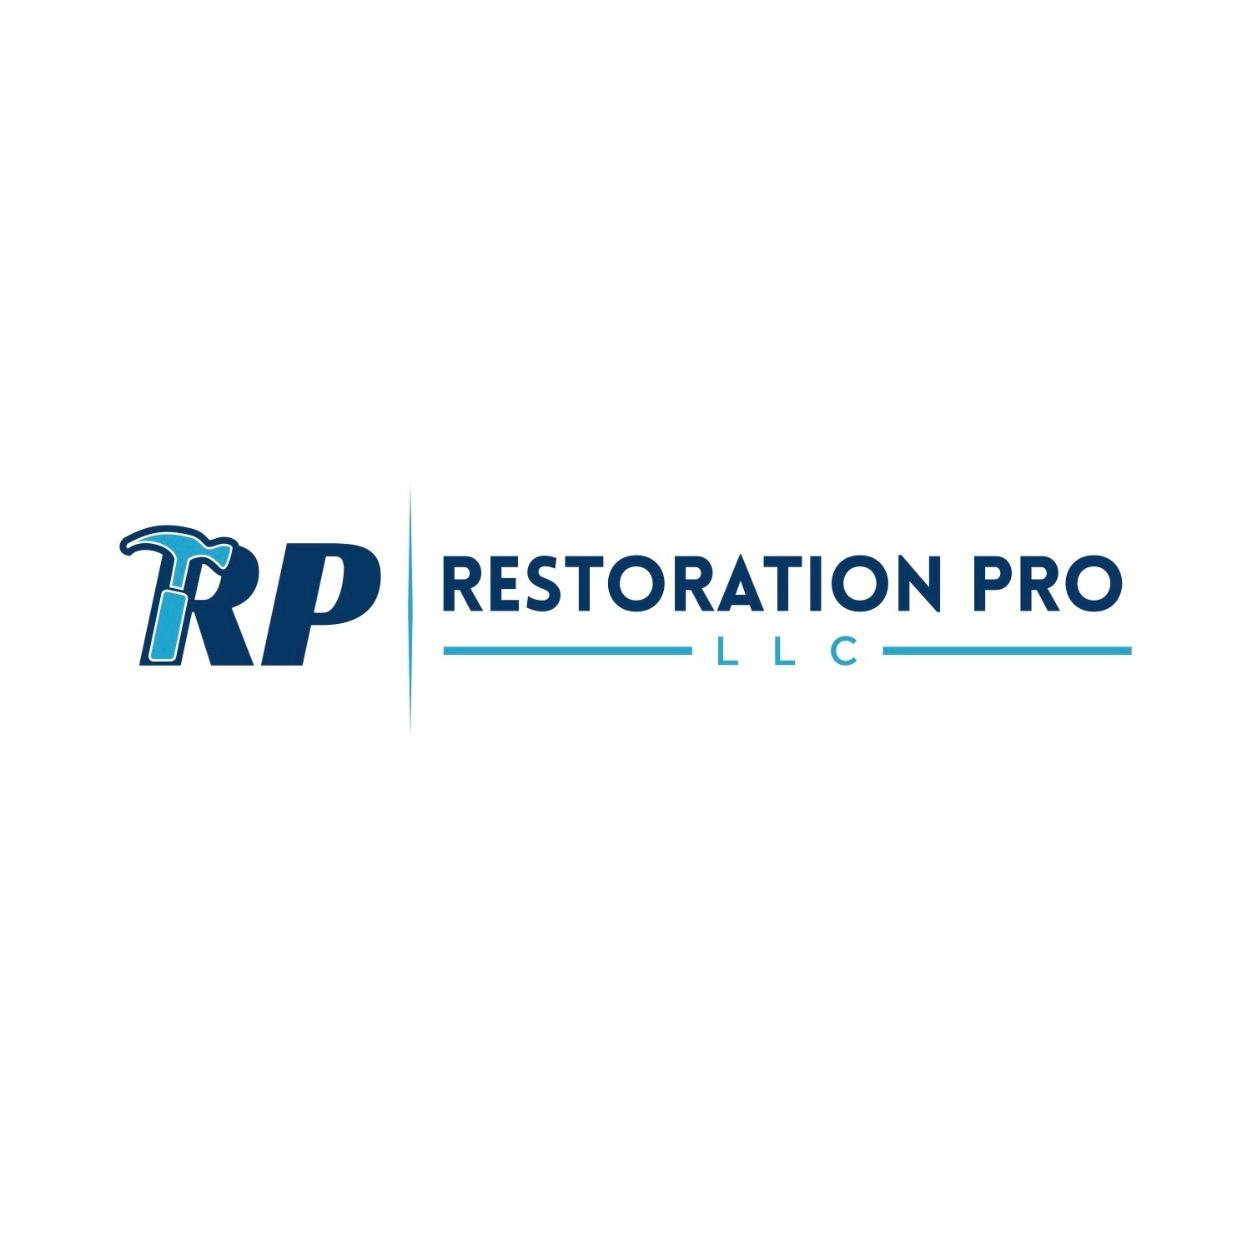 Restoration Pro LLC image 18